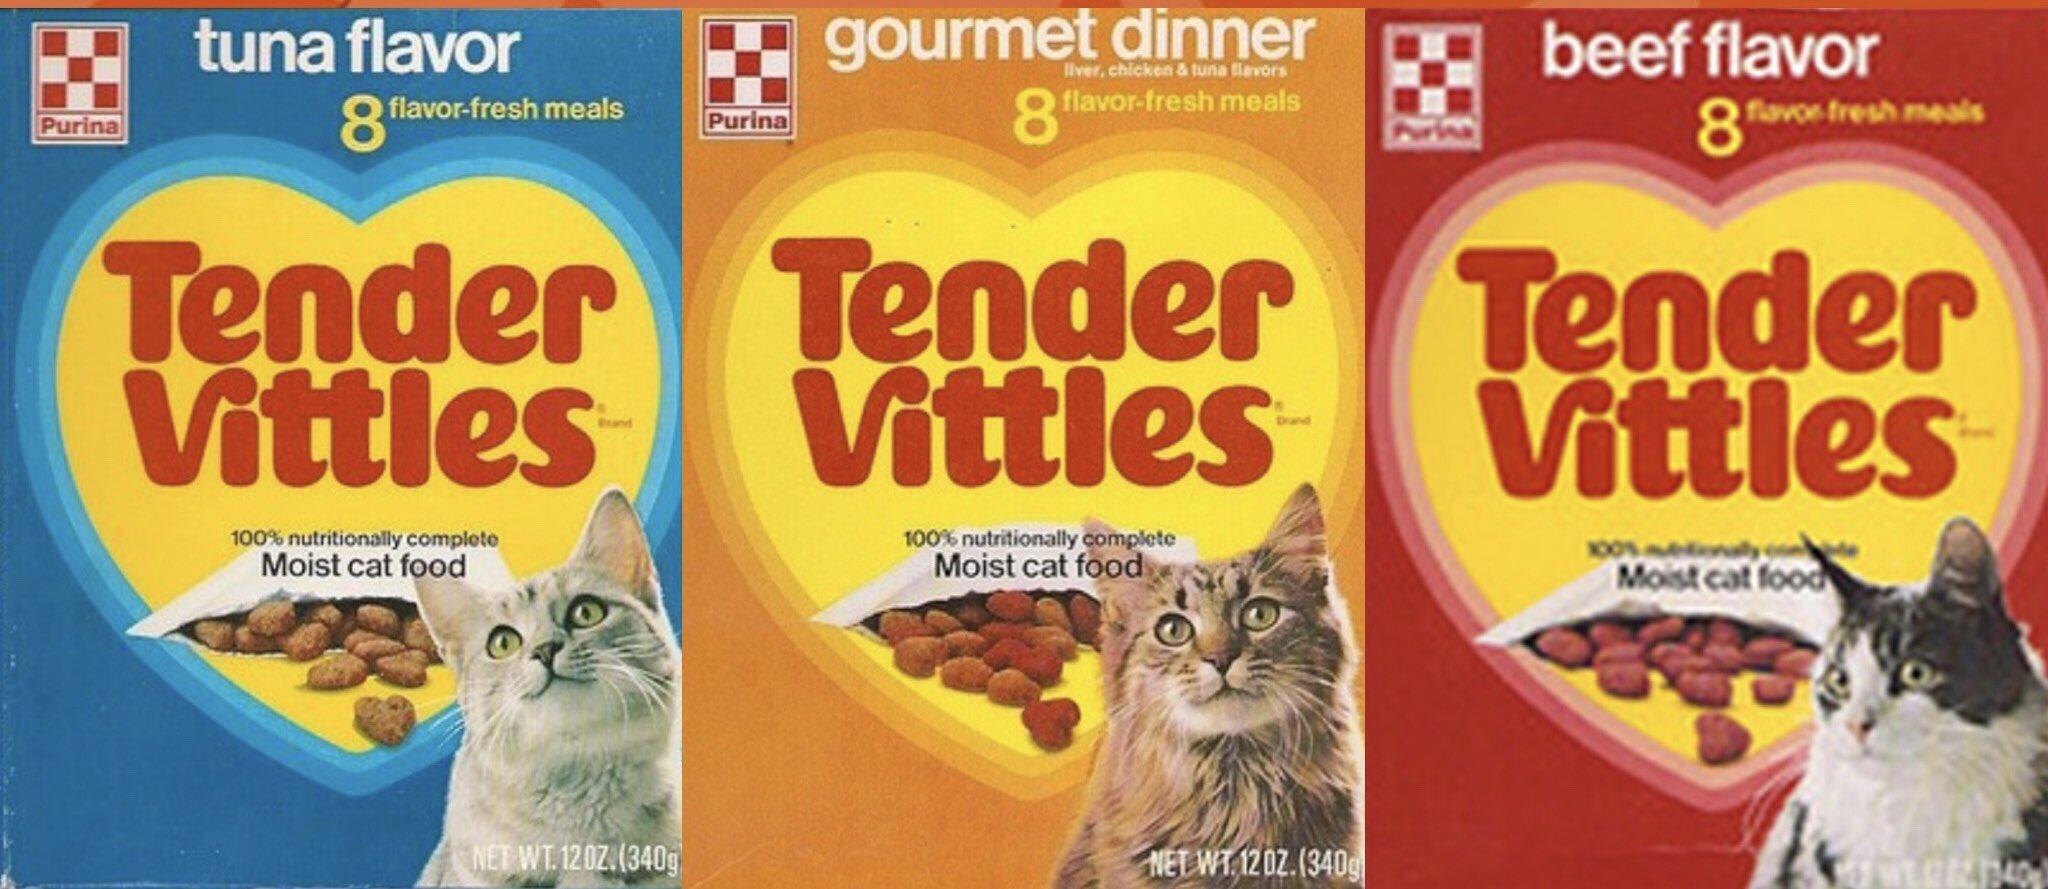 80sthen80snow On Twitter Who Fed Their Cat Tender Vittles Tendervittles Catfood Food Cats Cat Kittens Kitten Kitties Meow Tuna Chicken Gourmet Beef Https T Co 8ljwilxo3y